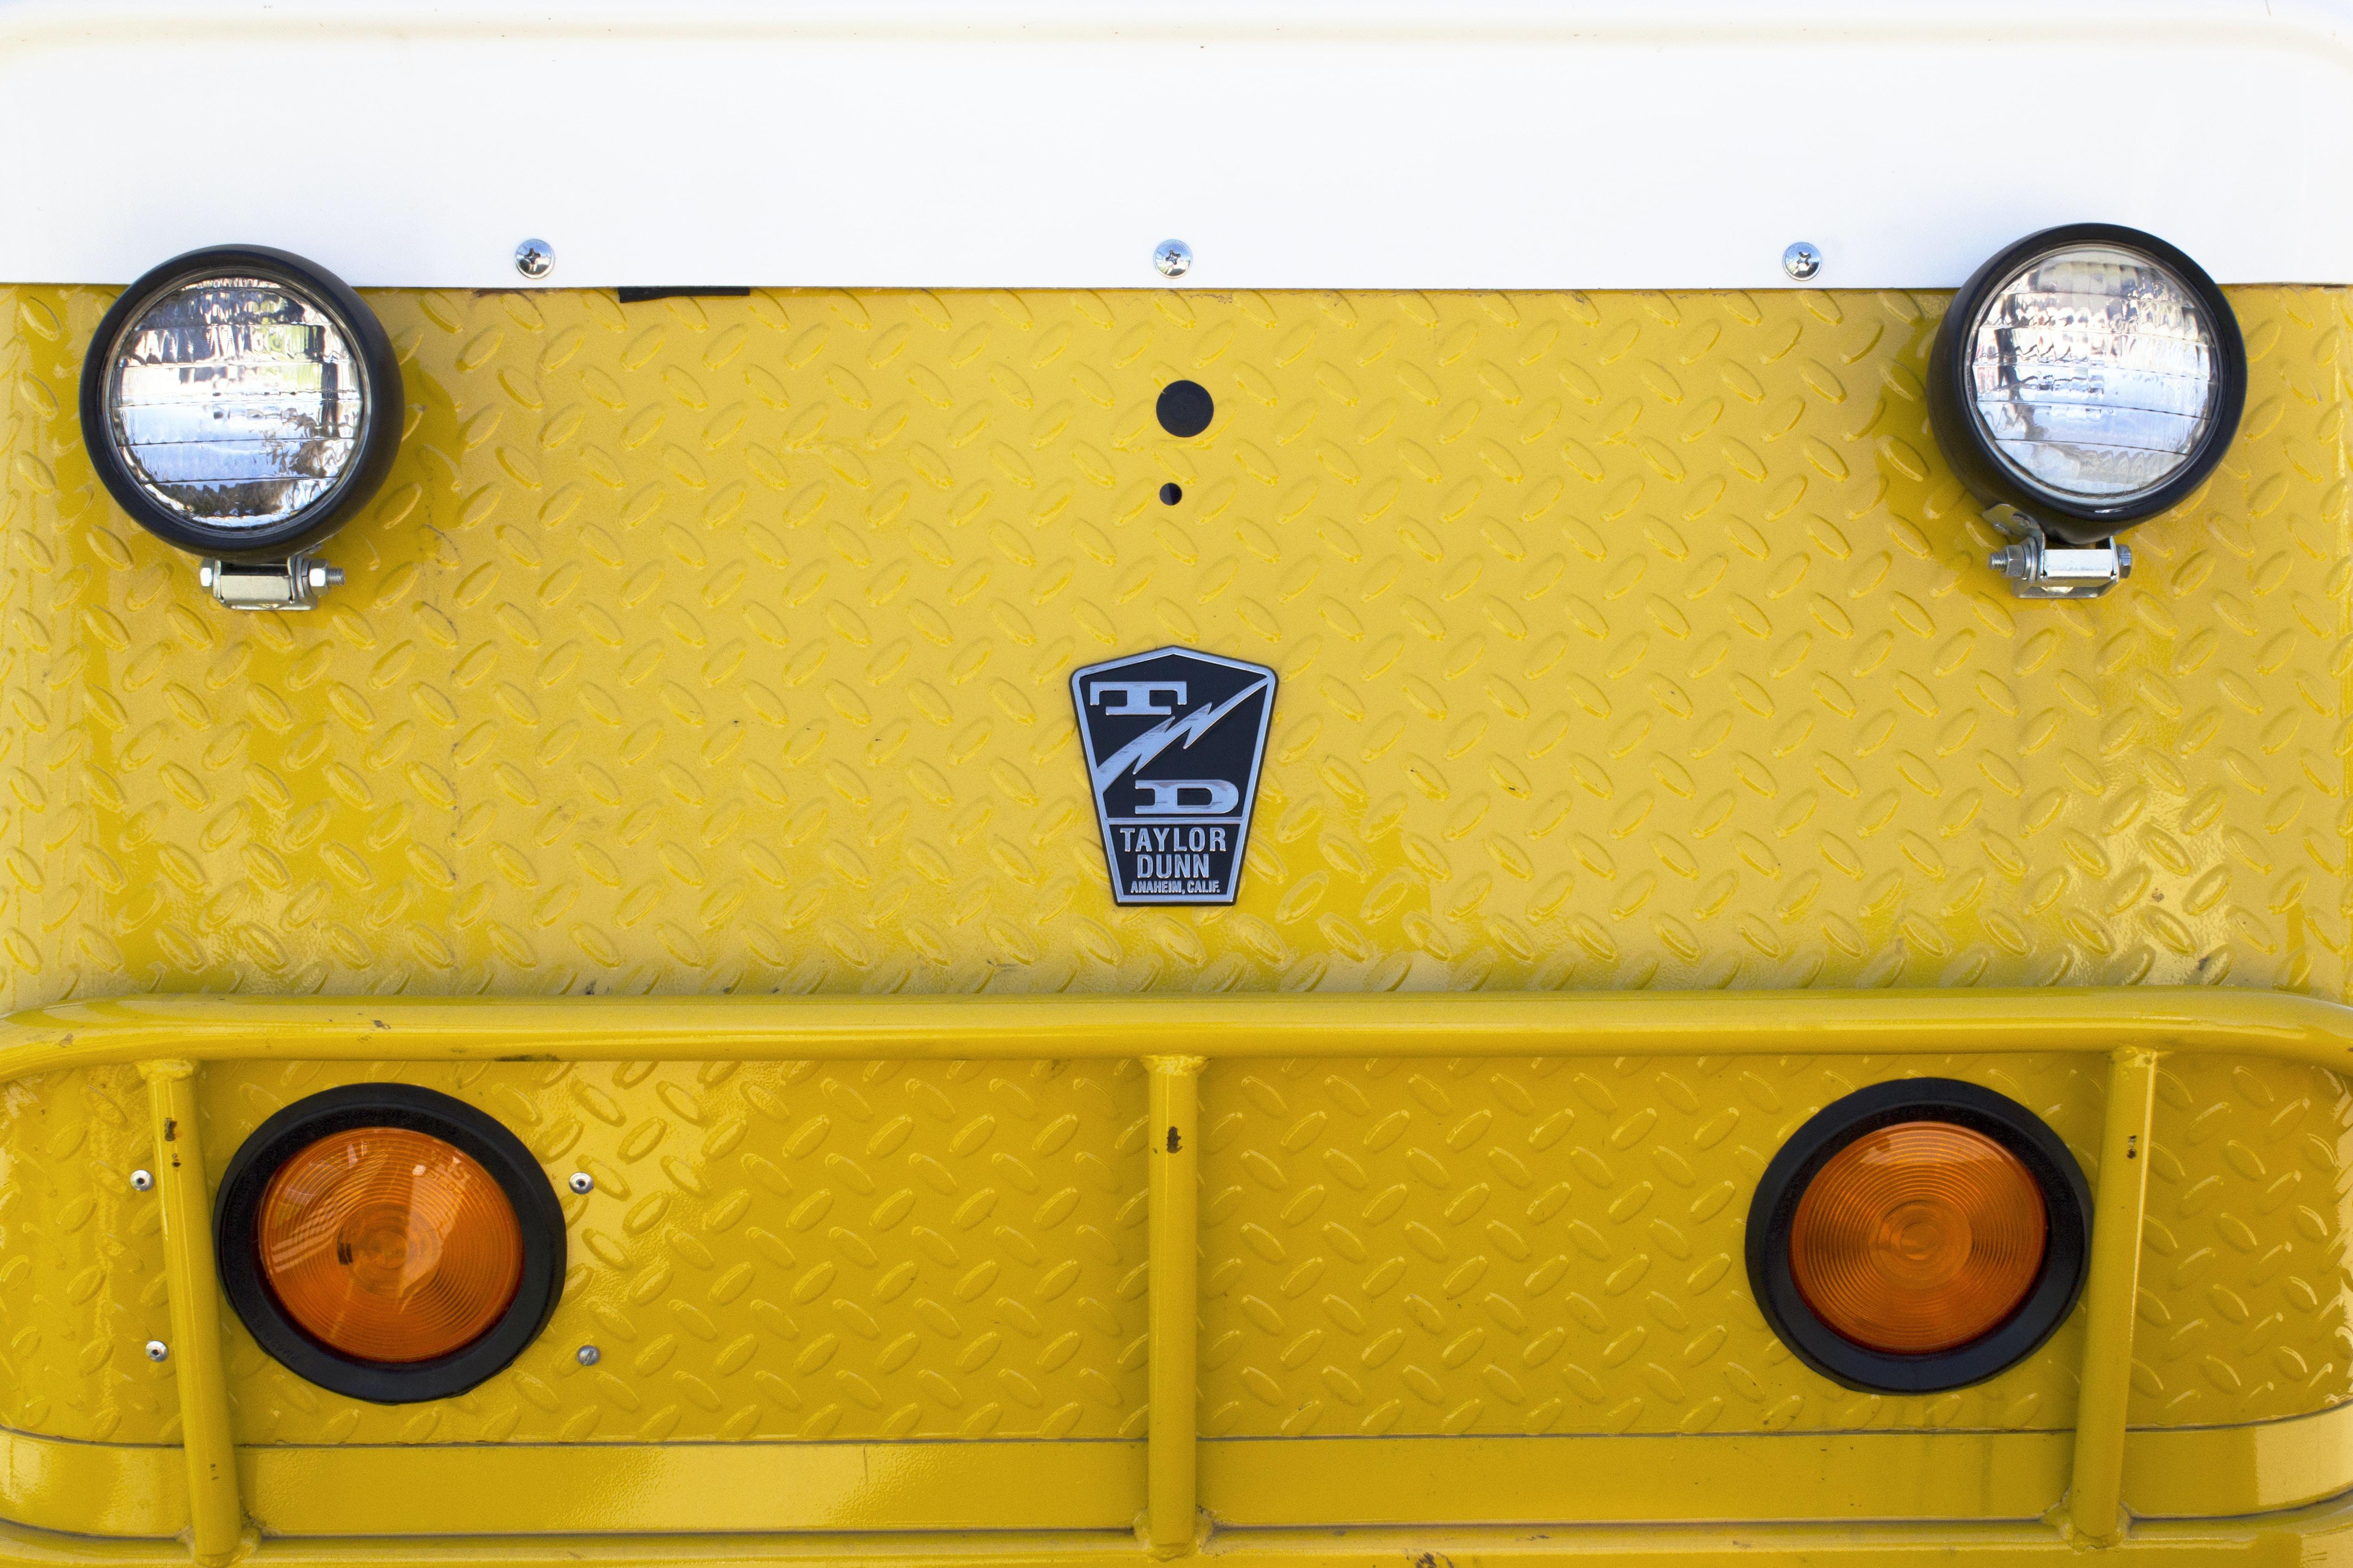 closeup photo of yellow vehicle